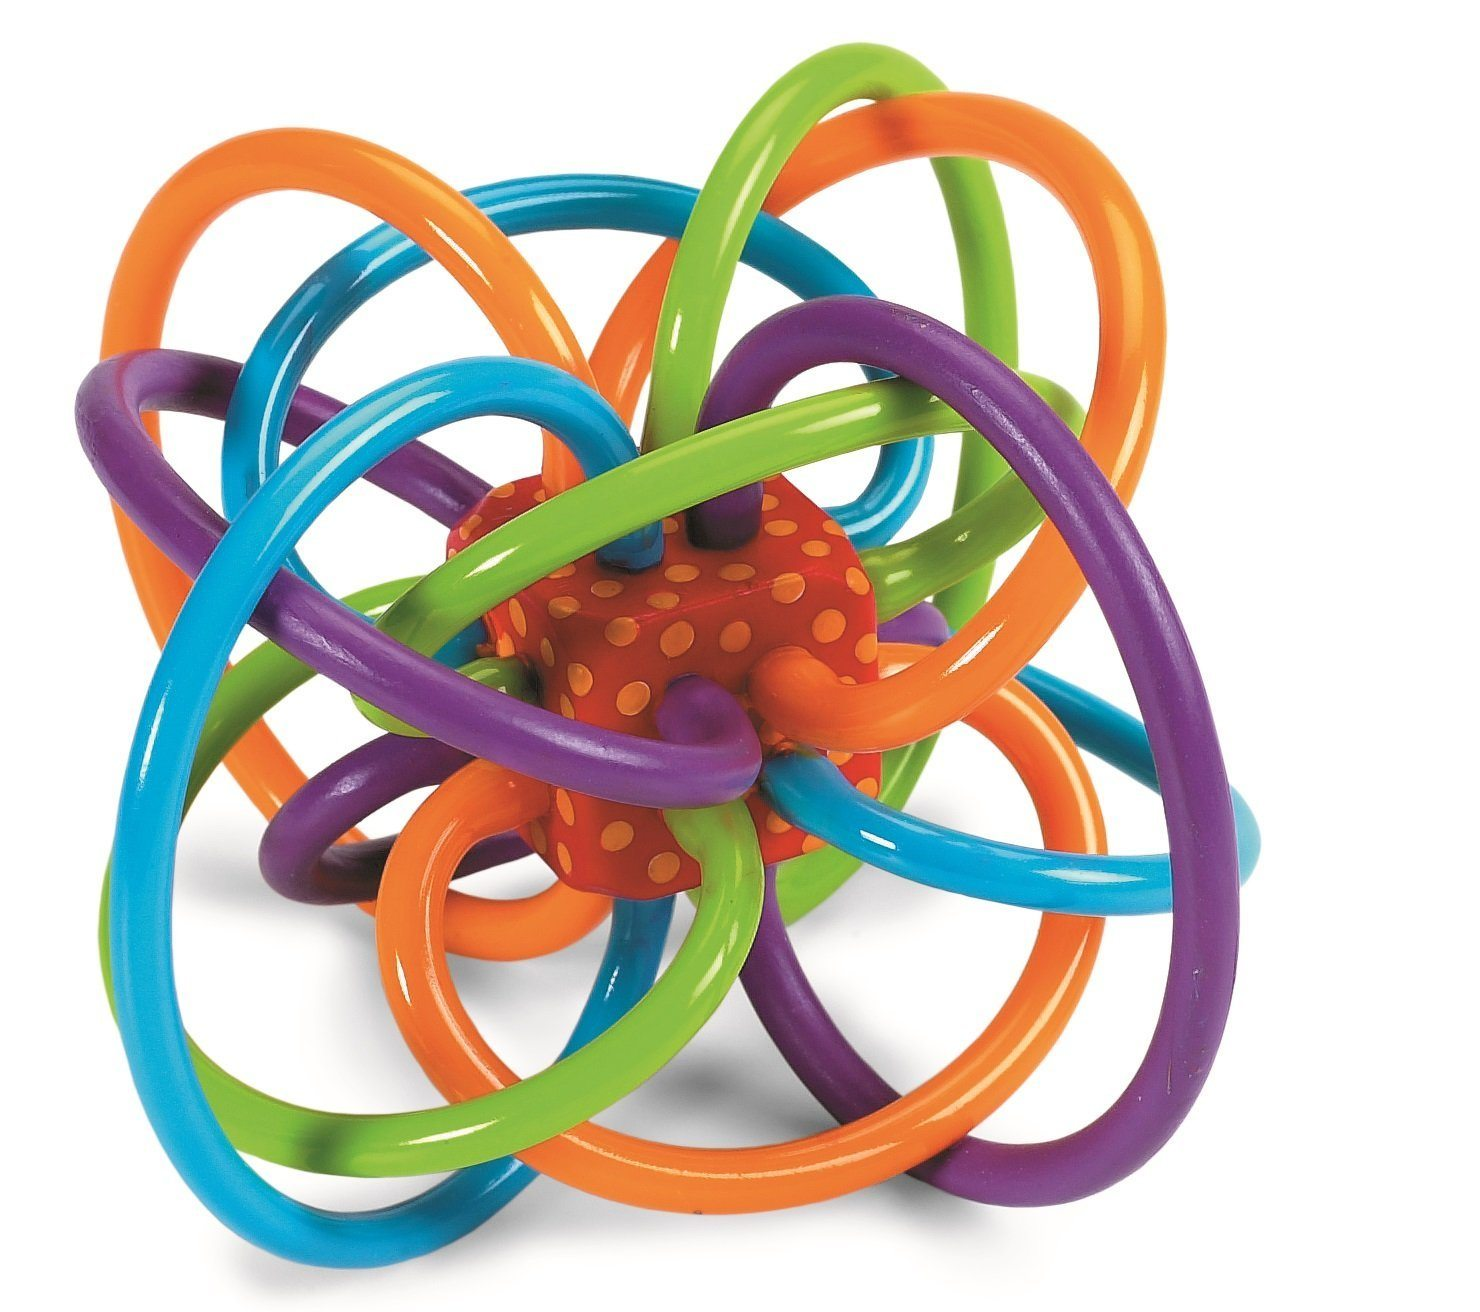 71drfXxQz3L. SL1480  - Manhattan Toy Winkel Rattle and Sensory Teether Activity Toy